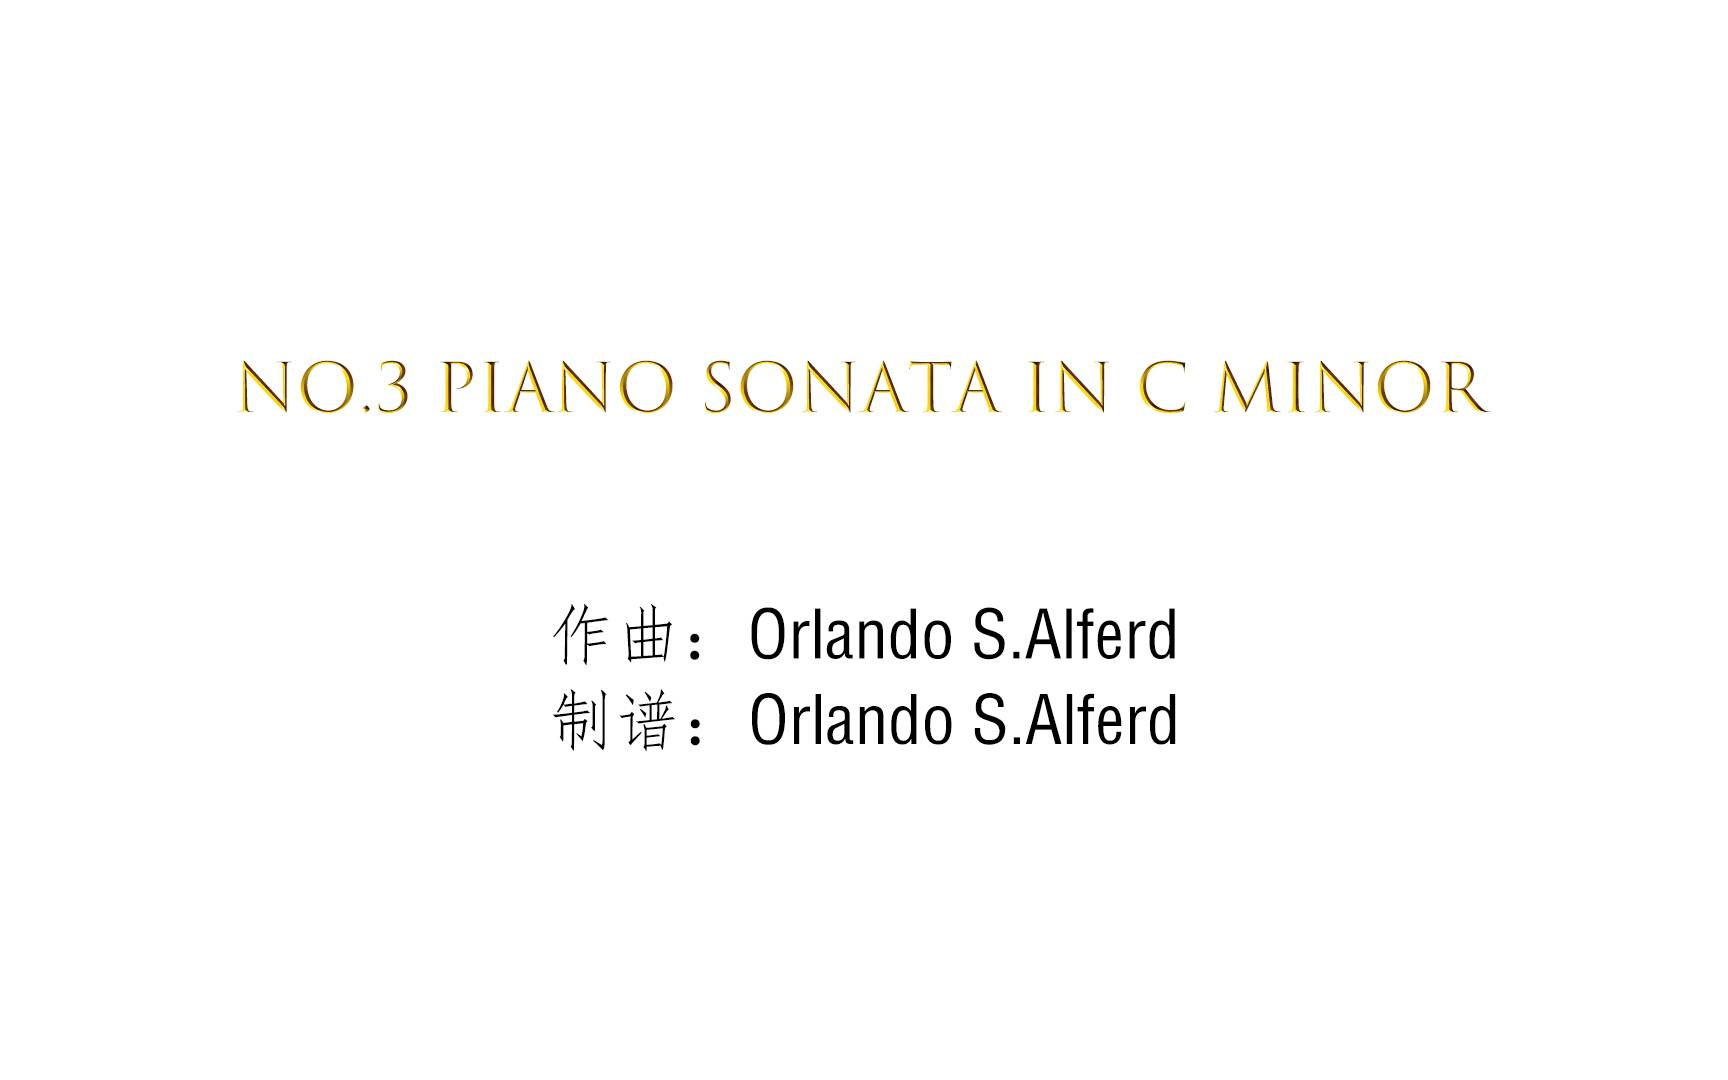 No 3 Piano Sonata In C minor(第三号C小调钢琴奏鸣曲)